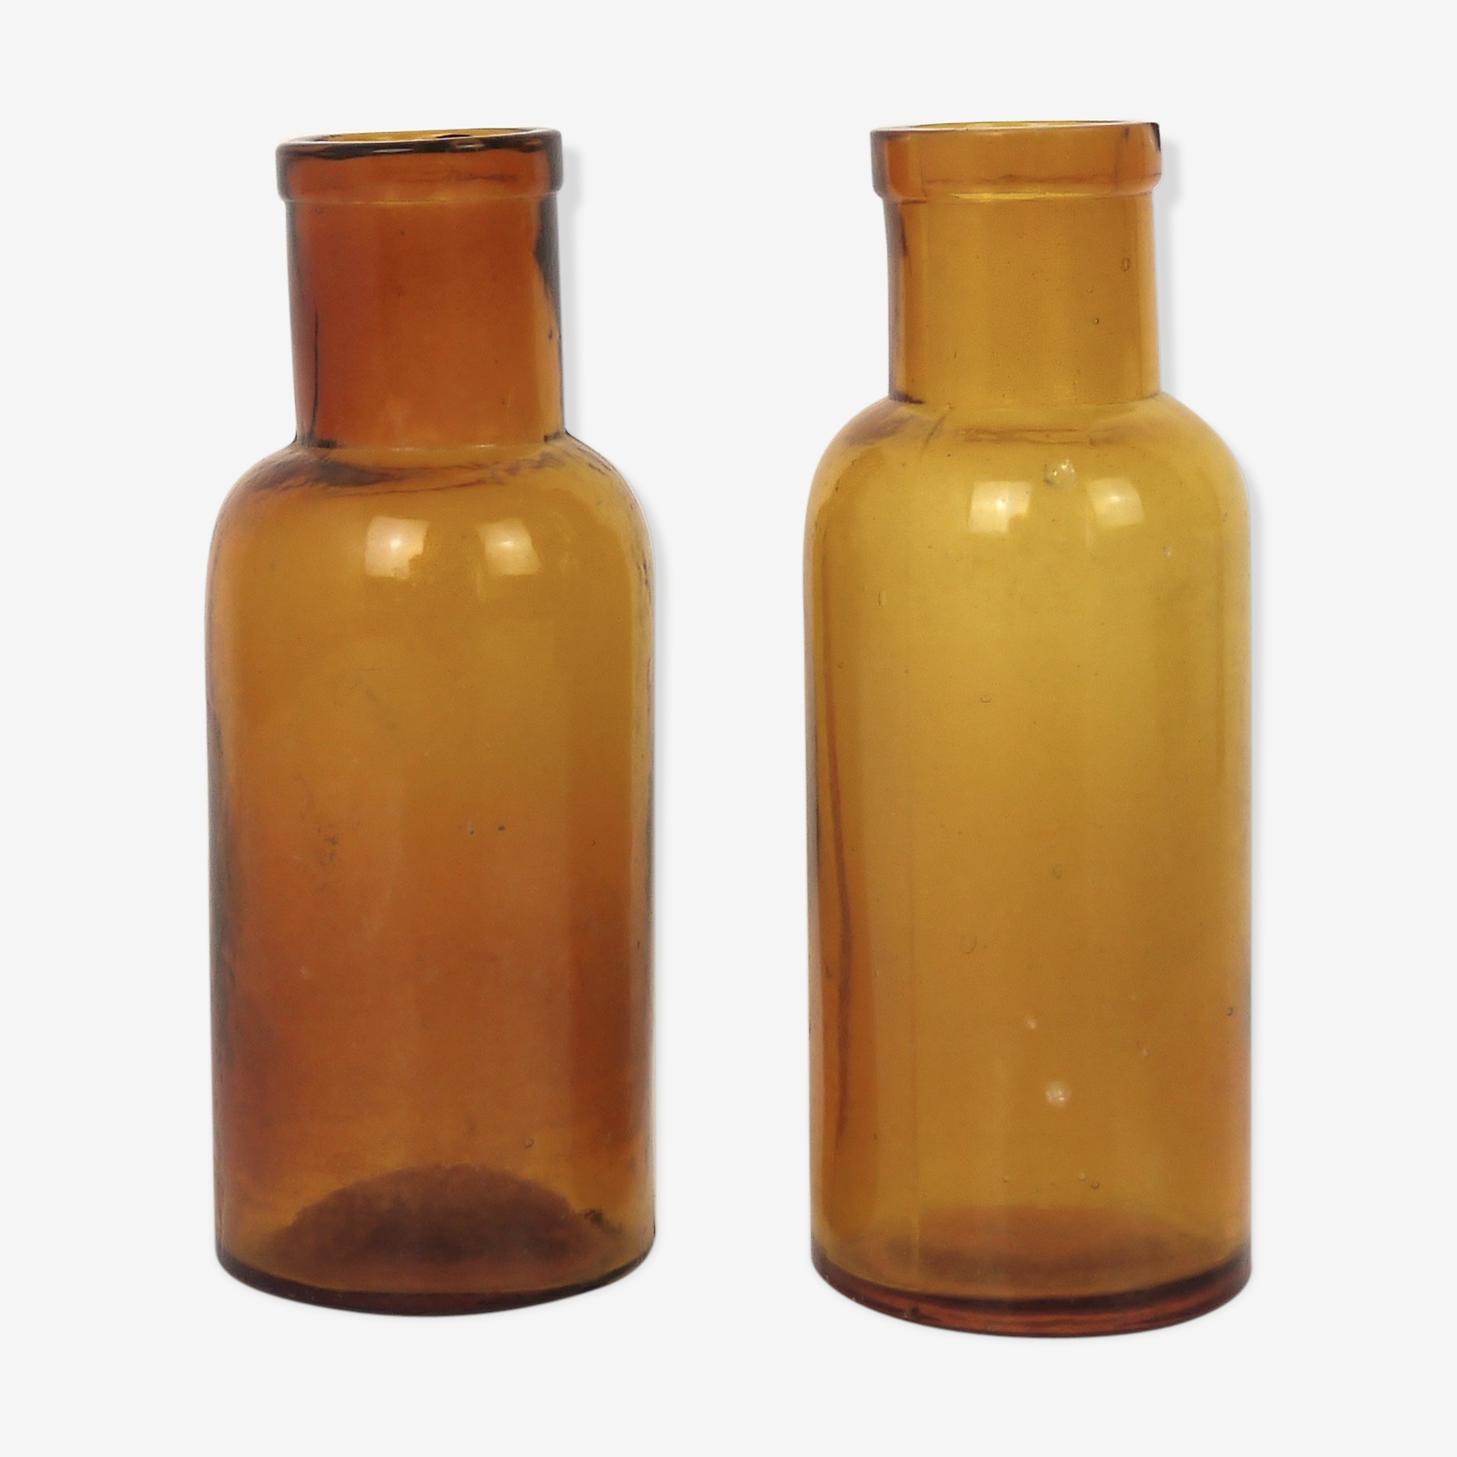 Deux flacons de pharmacie en verre brun